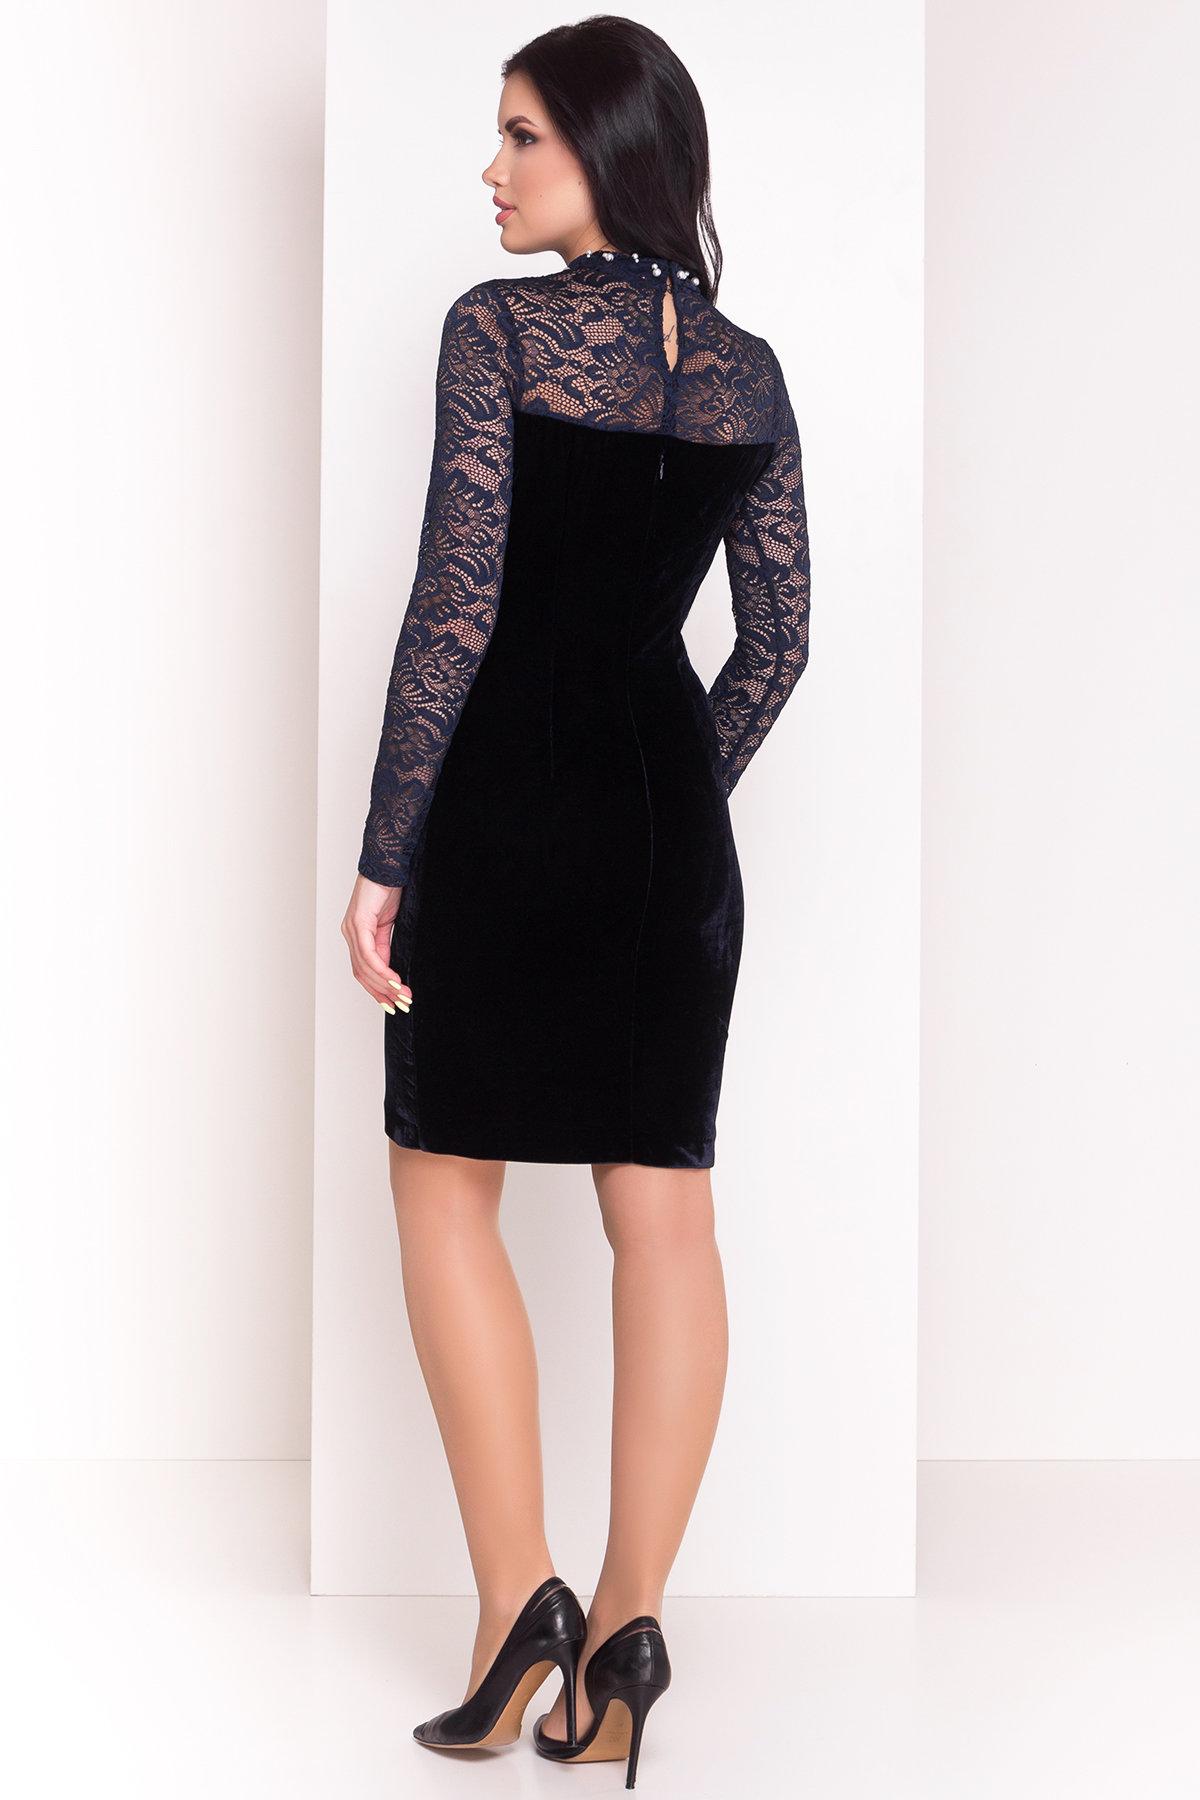 Платье Гоже 4185 АРТ. 20647 Цвет: Темно-синий - фото 2, интернет магазин tm-modus.ru